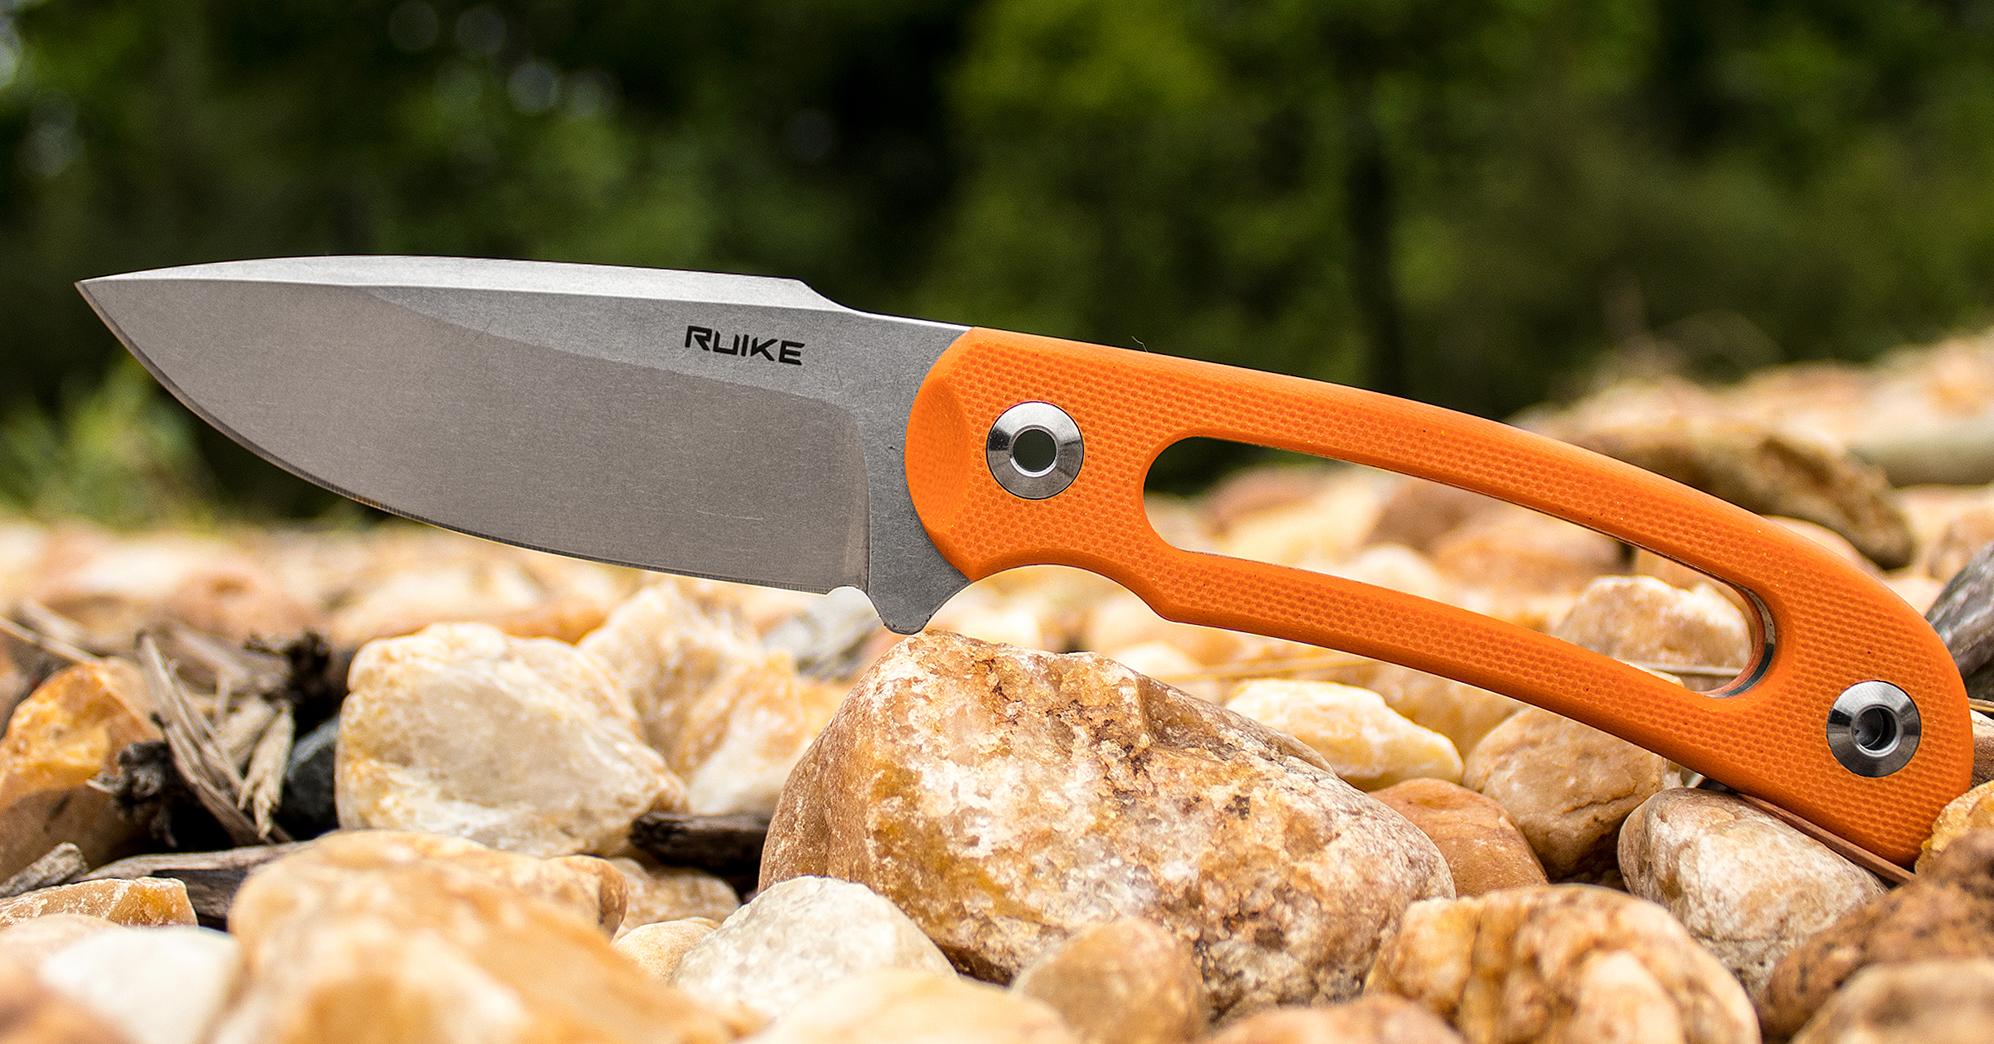 RUIKE Knives